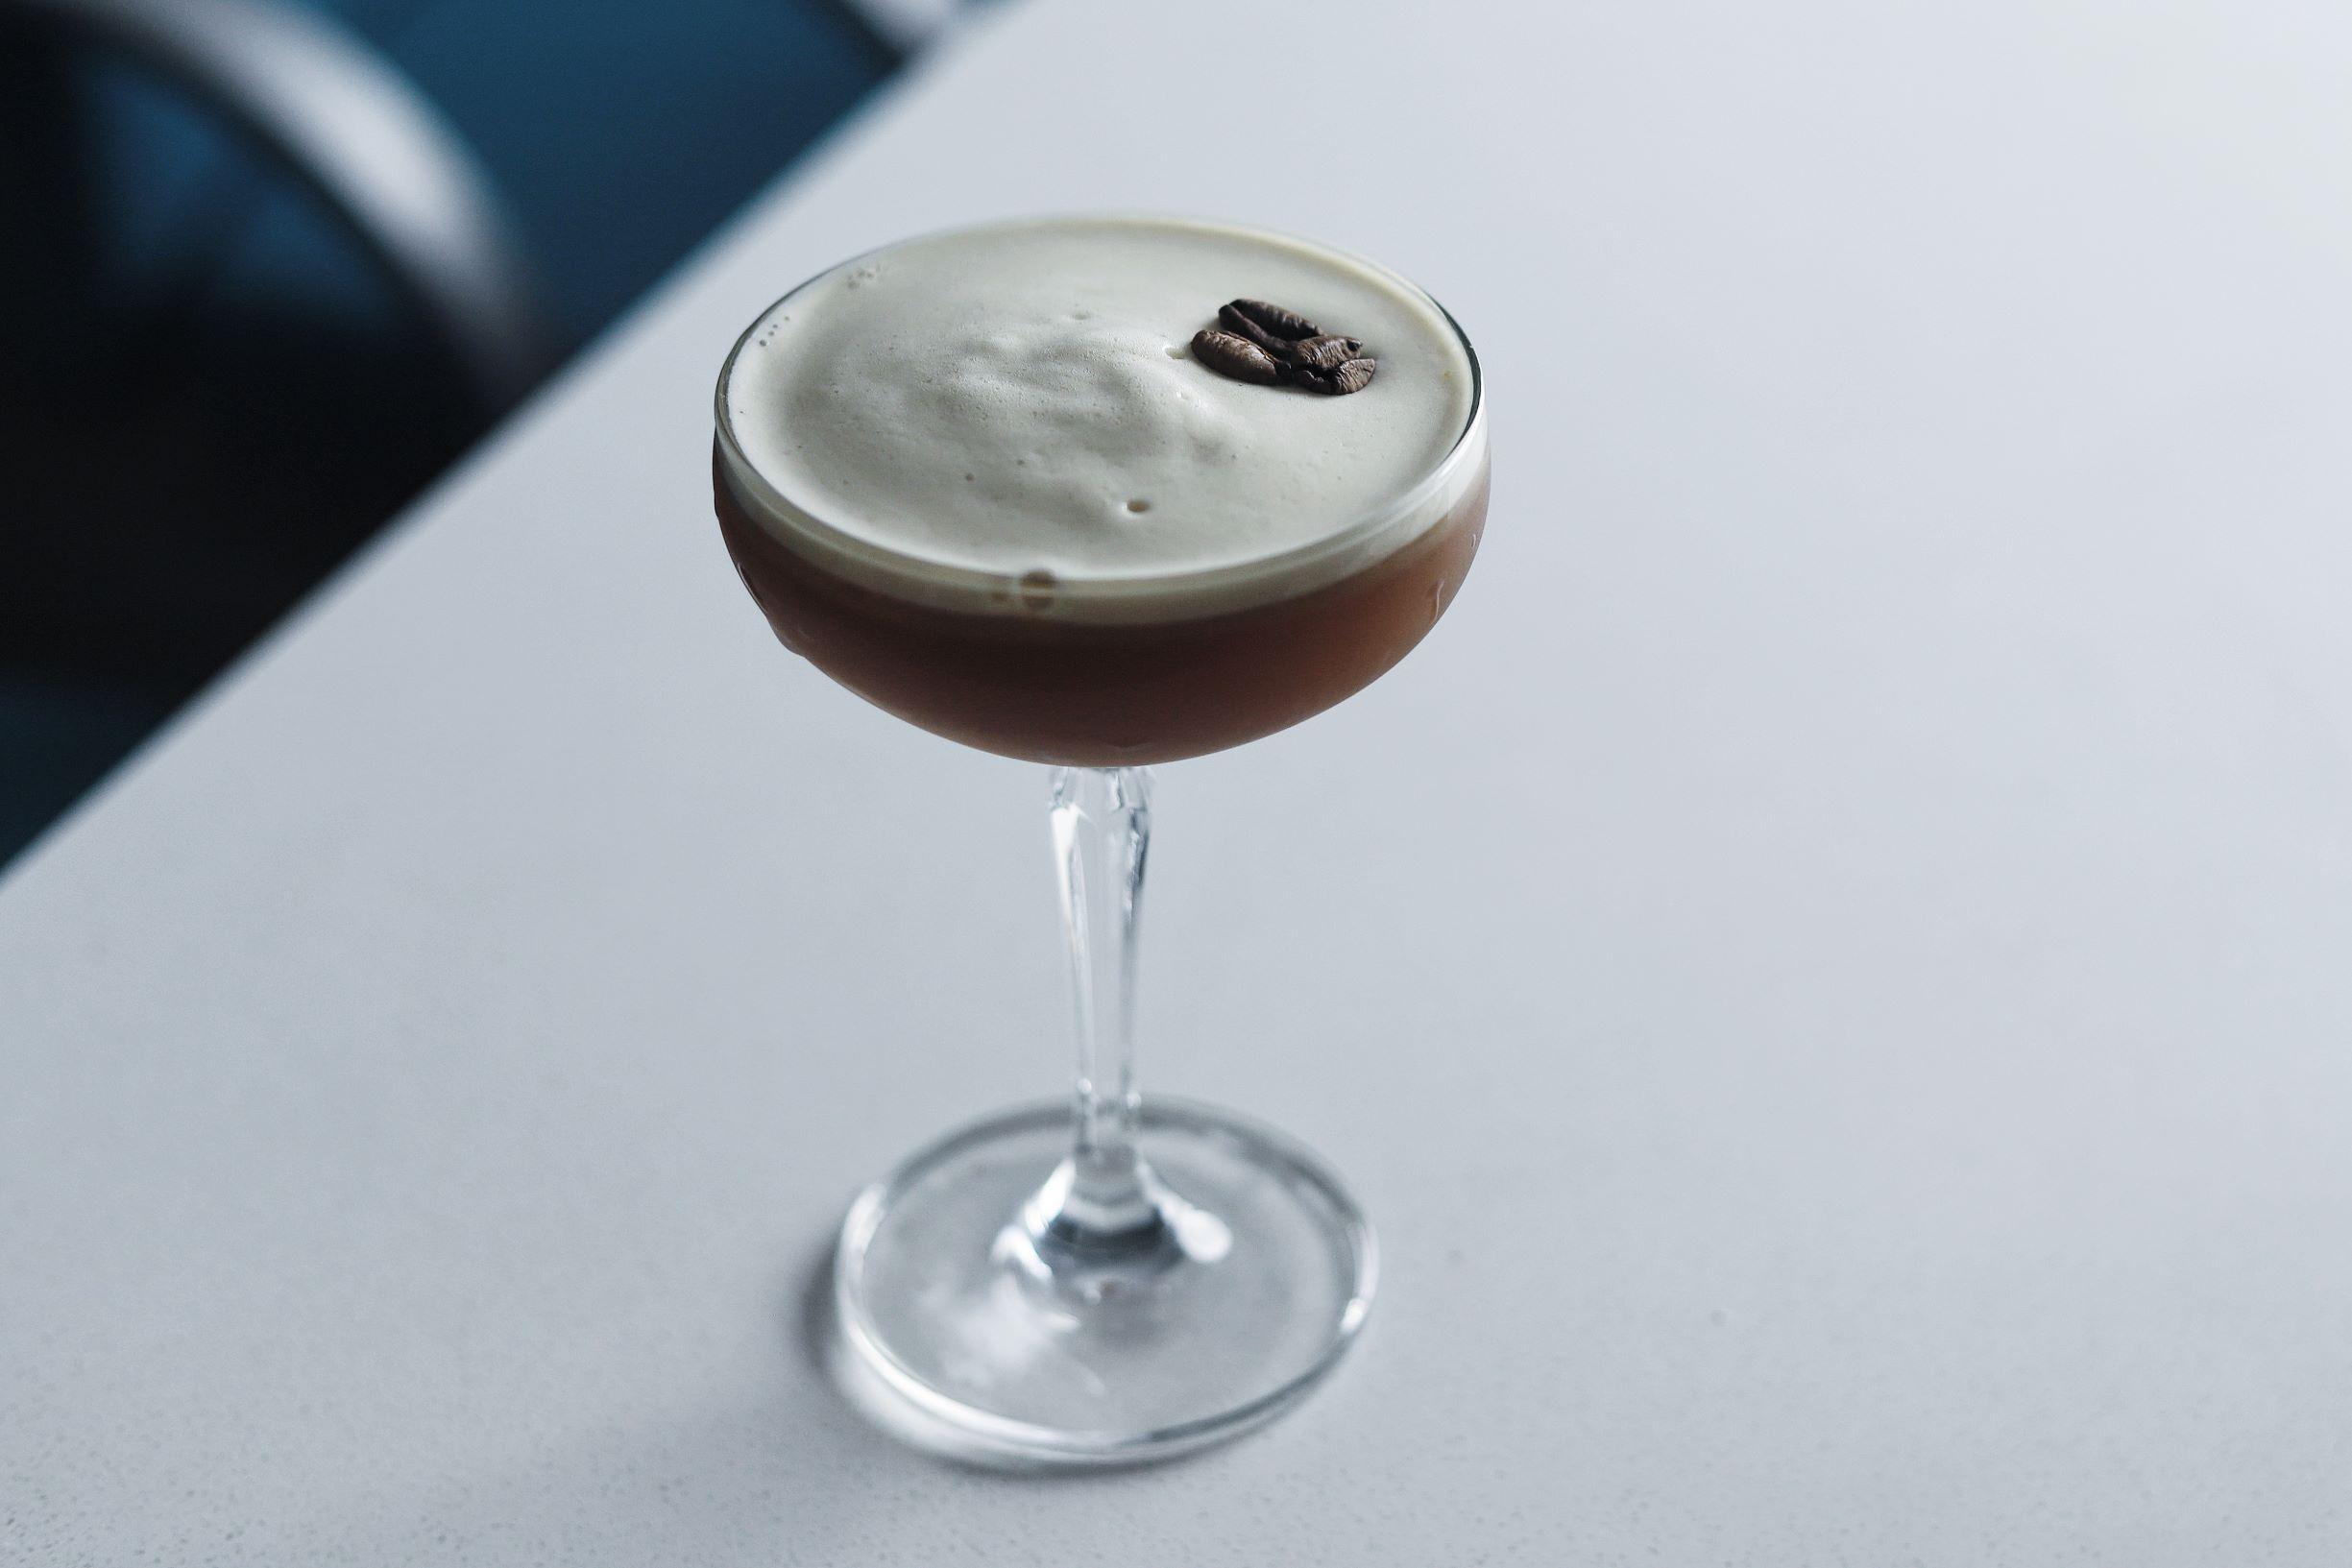 LeClair Organics Liberica Coffee, best espresso martini recipes, belvedere polish vodka, coffee cocktail recipes